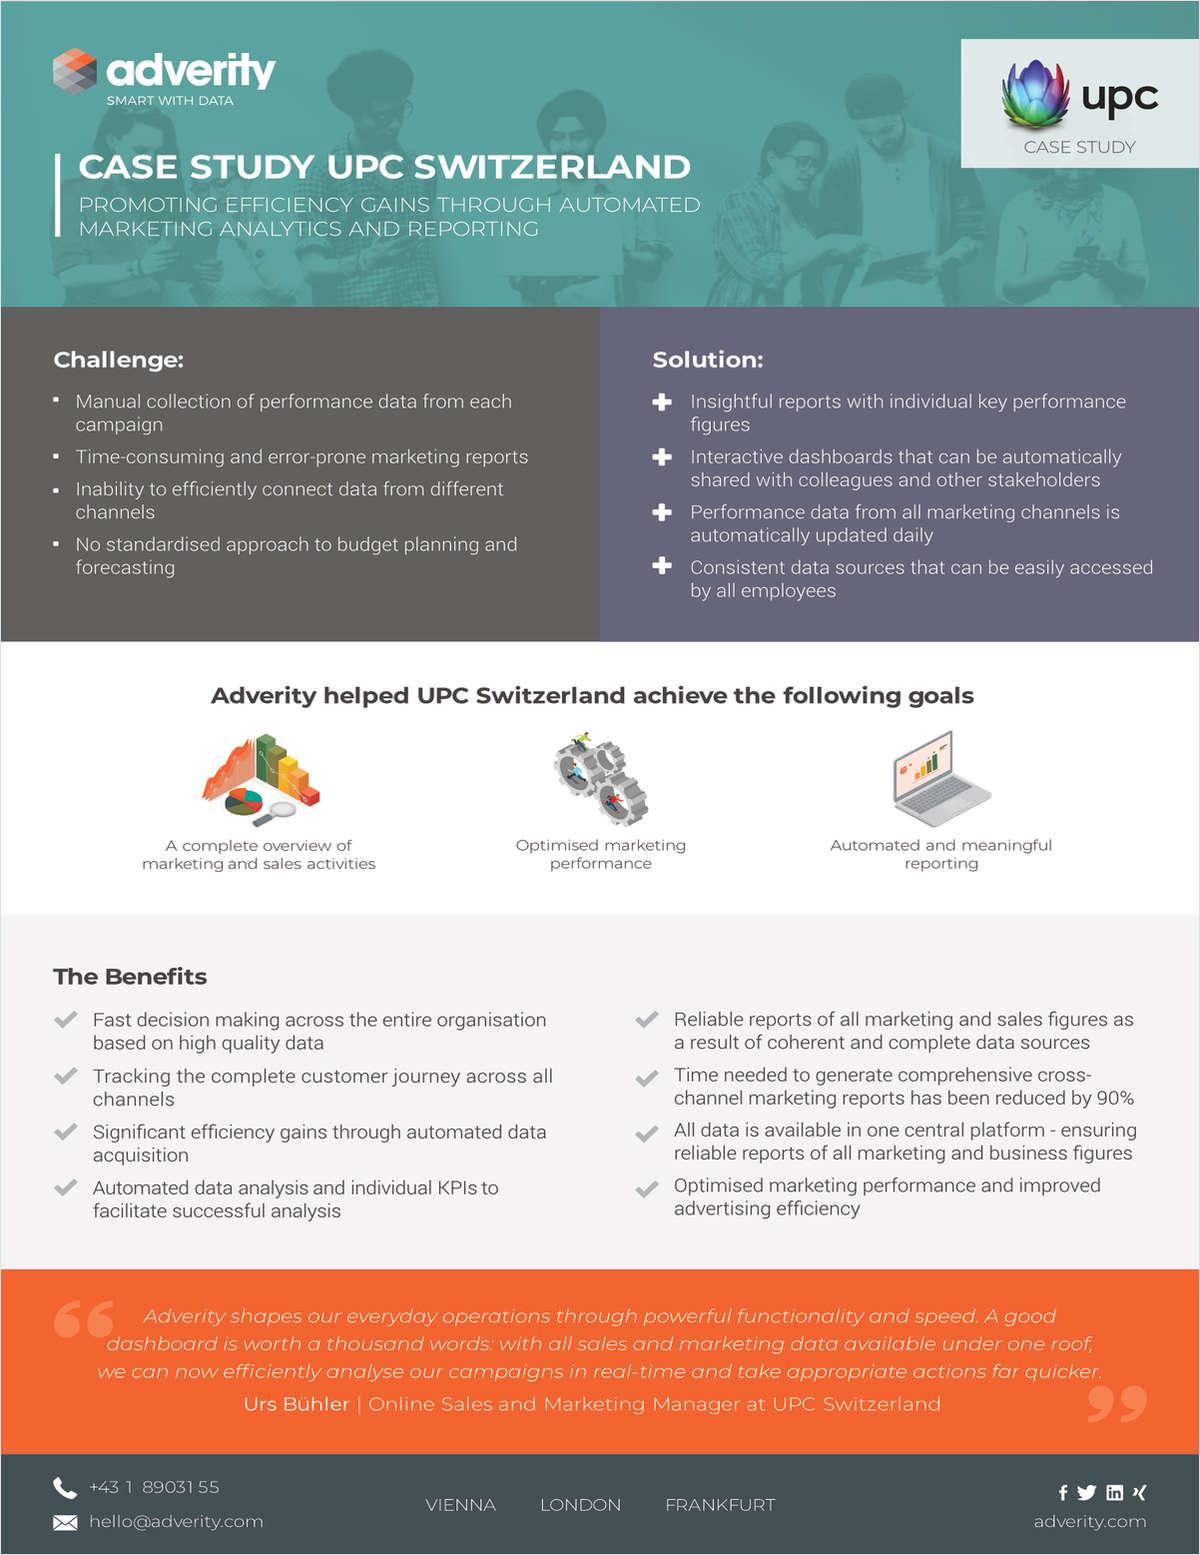 Case Study: Automated Marketing Reporting UPC Switzerland